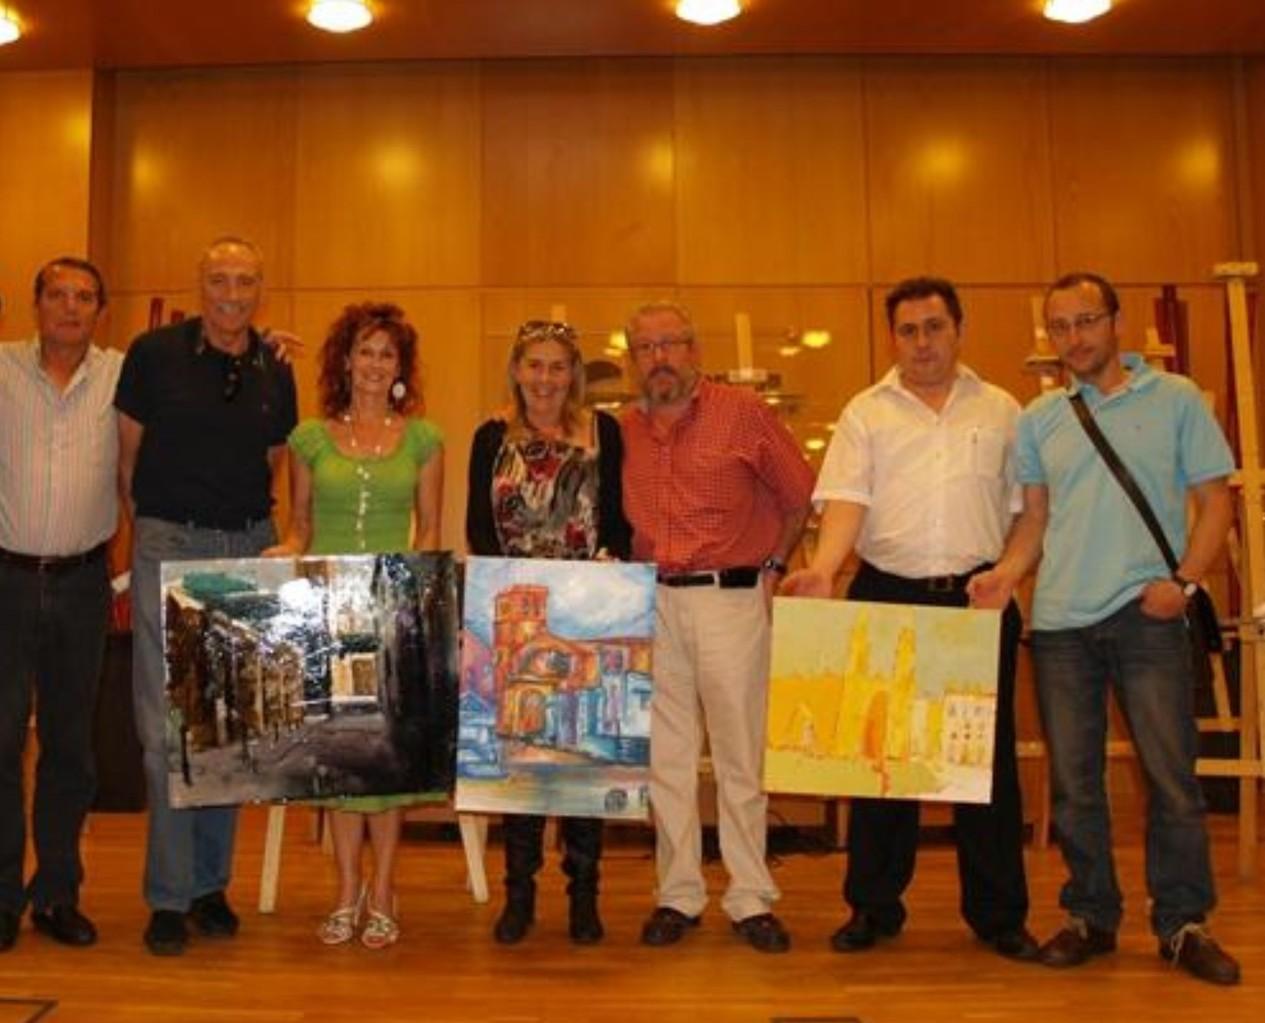 Pintura...Marian Saralegui, Joserra Estebanez, Mª Marrodan, Juan Bernabé, Juanito, Lopez Garrido...